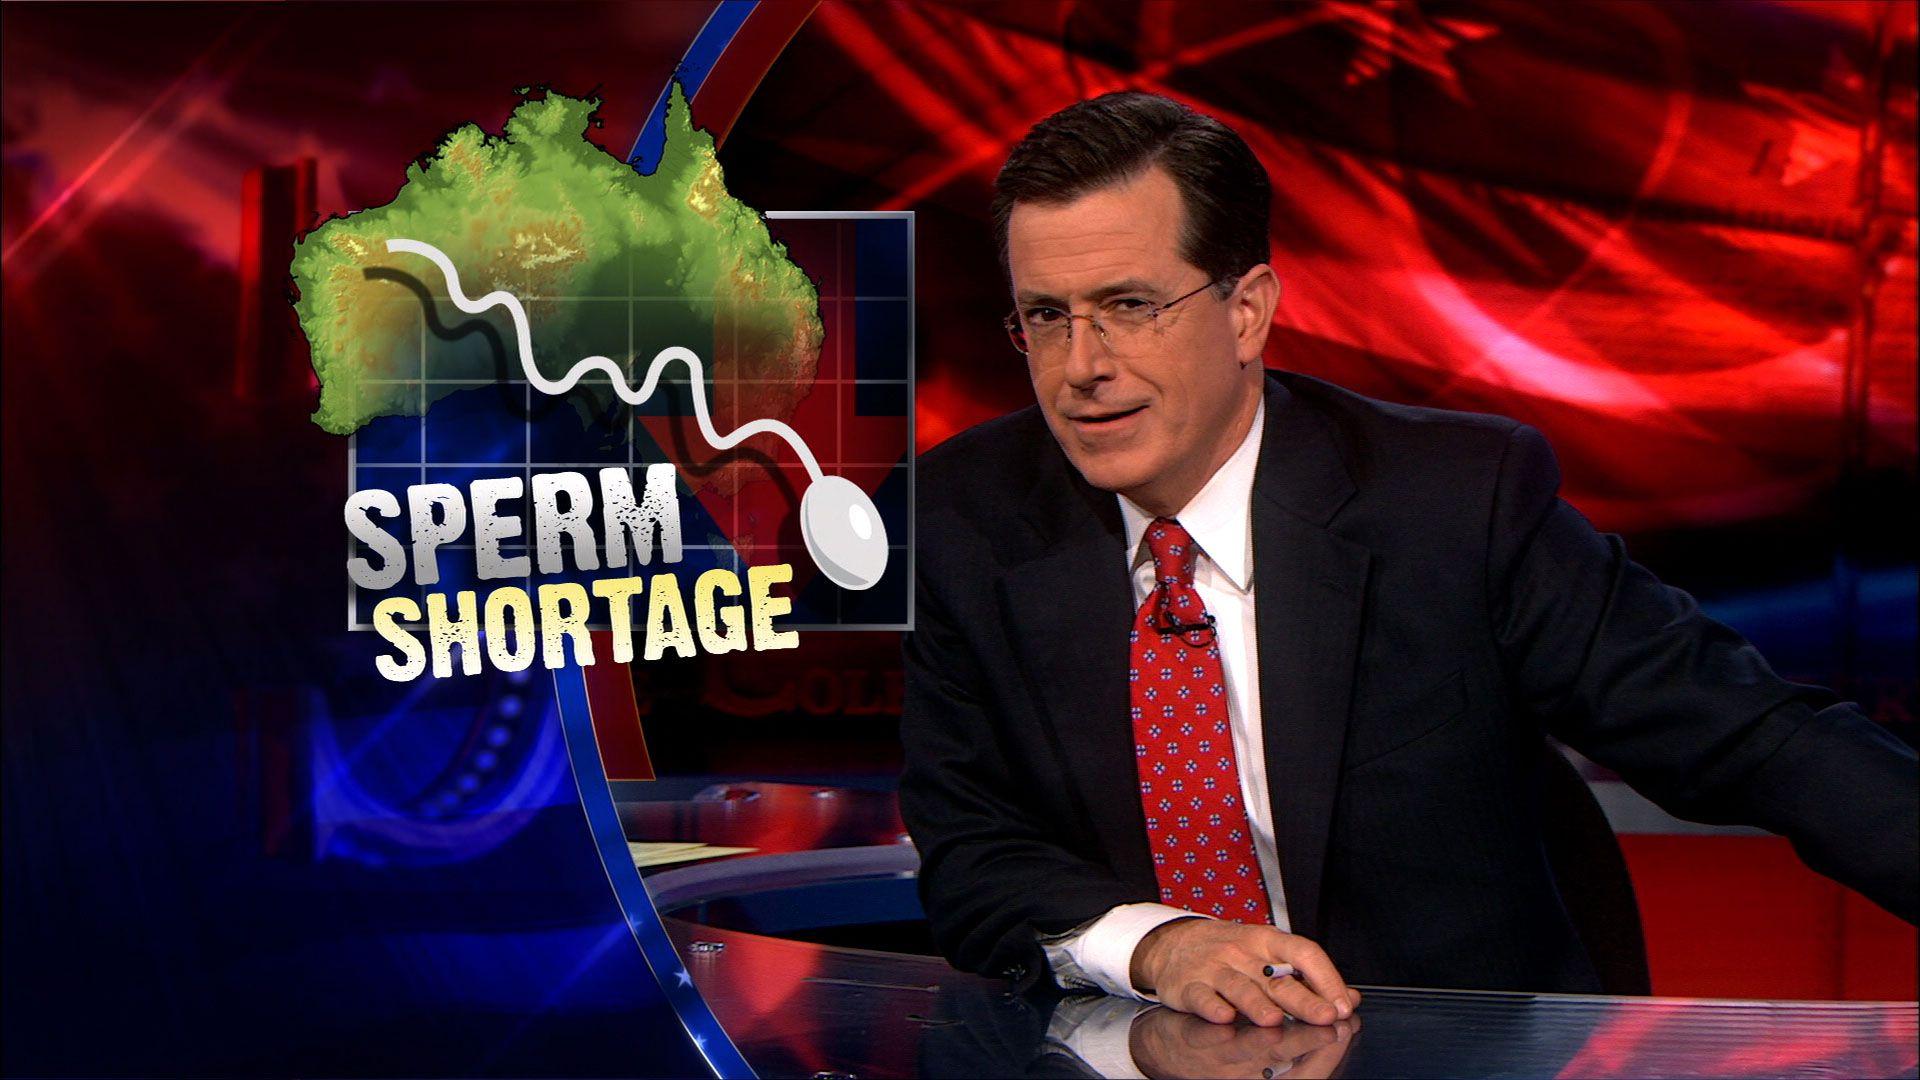 Australian sperm shortage